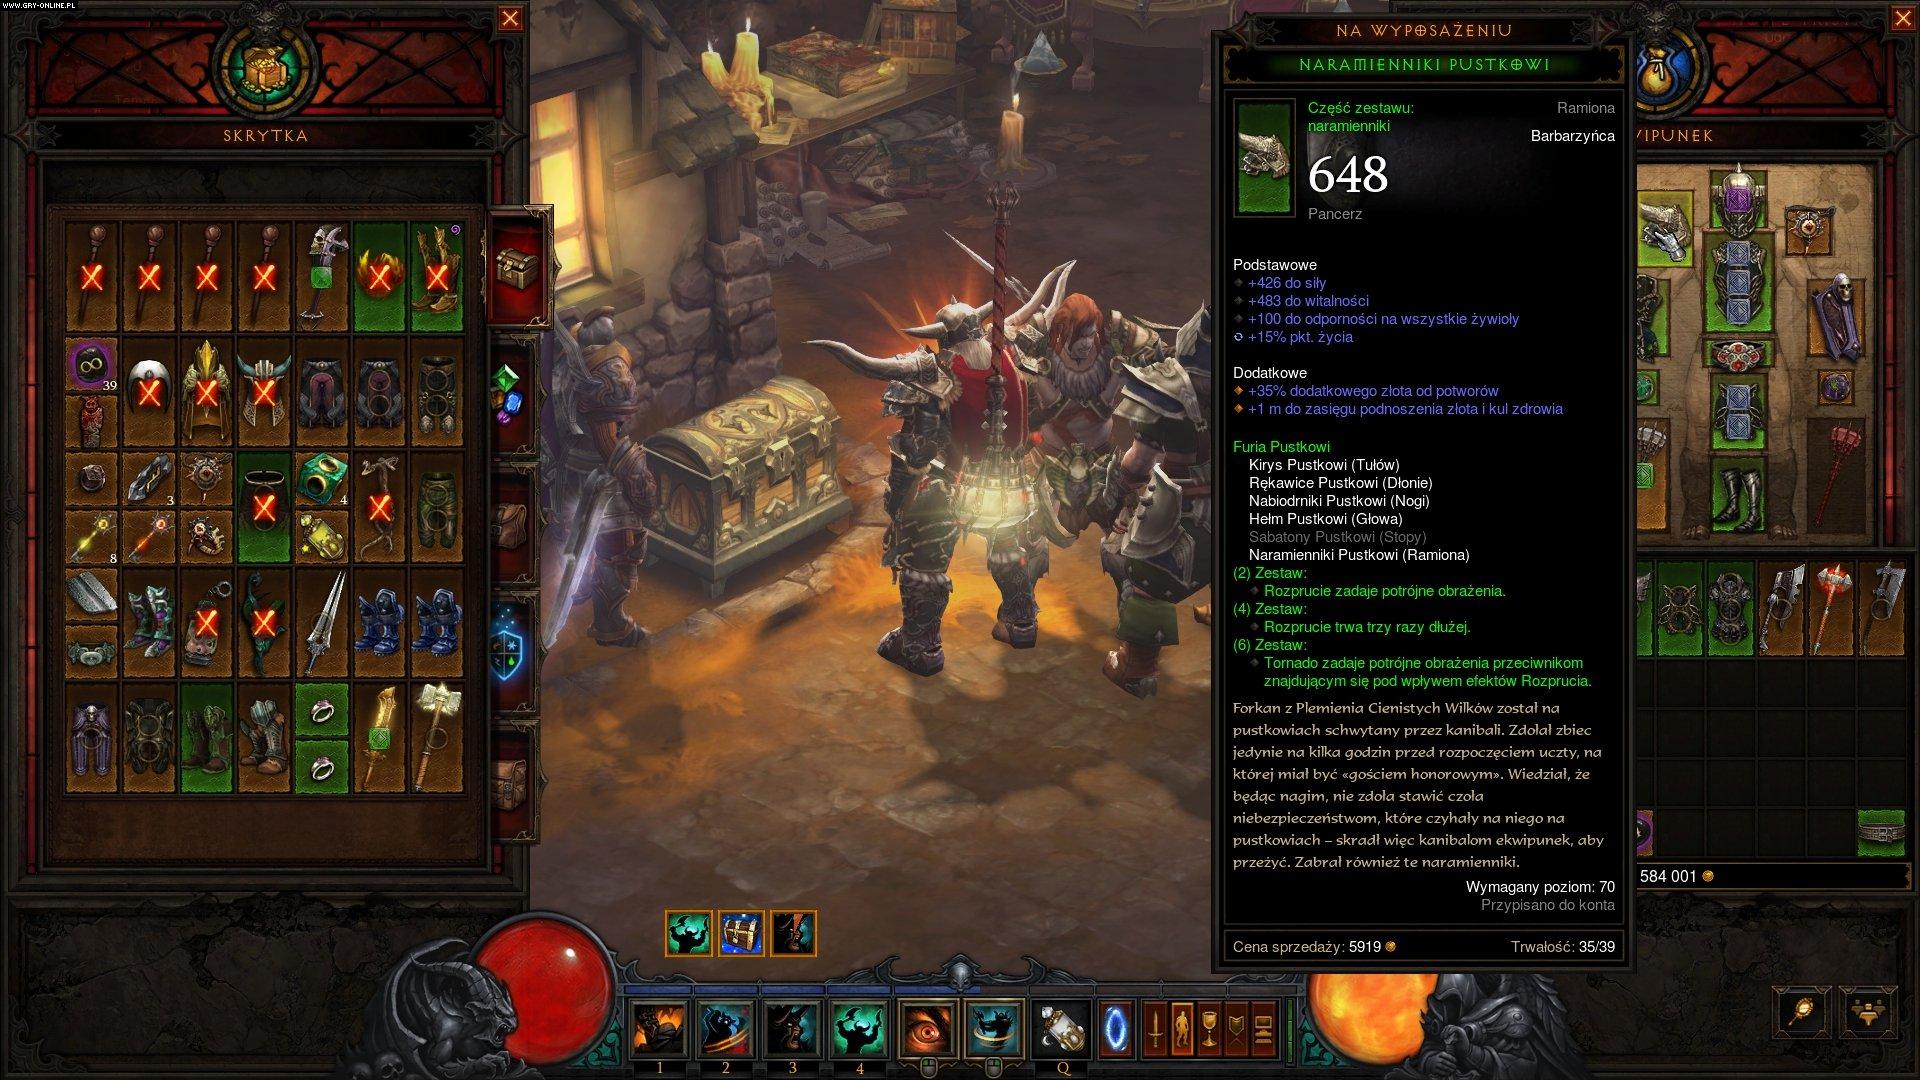 Diablo 2: Lord of Destruction Patch v113c - Download